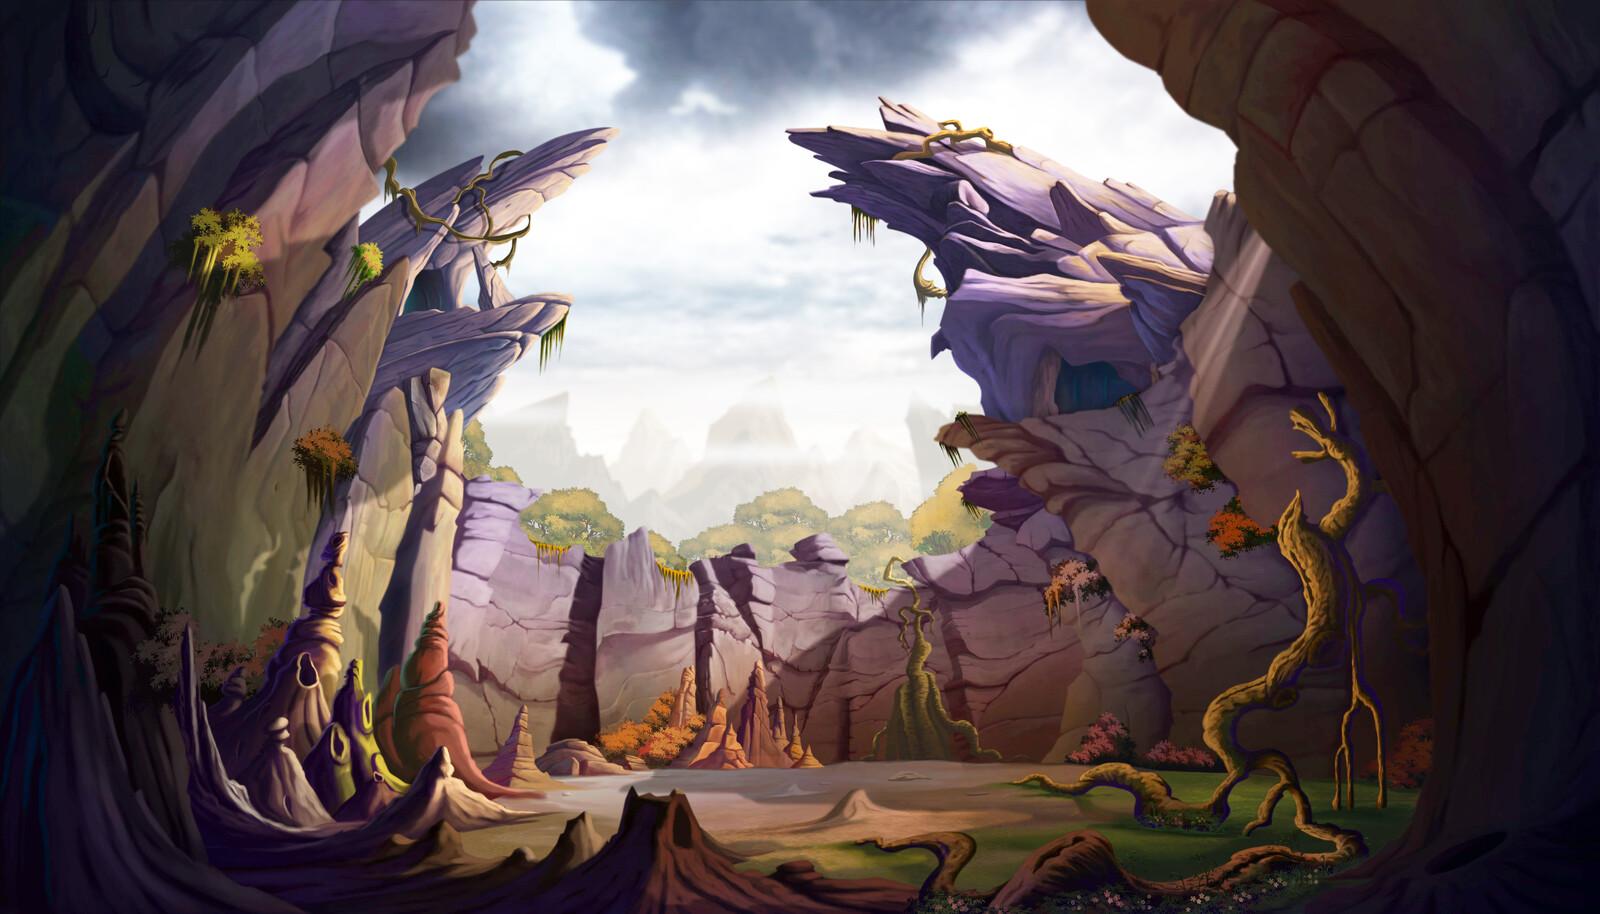 ArtStation - Silent hill, Dev N